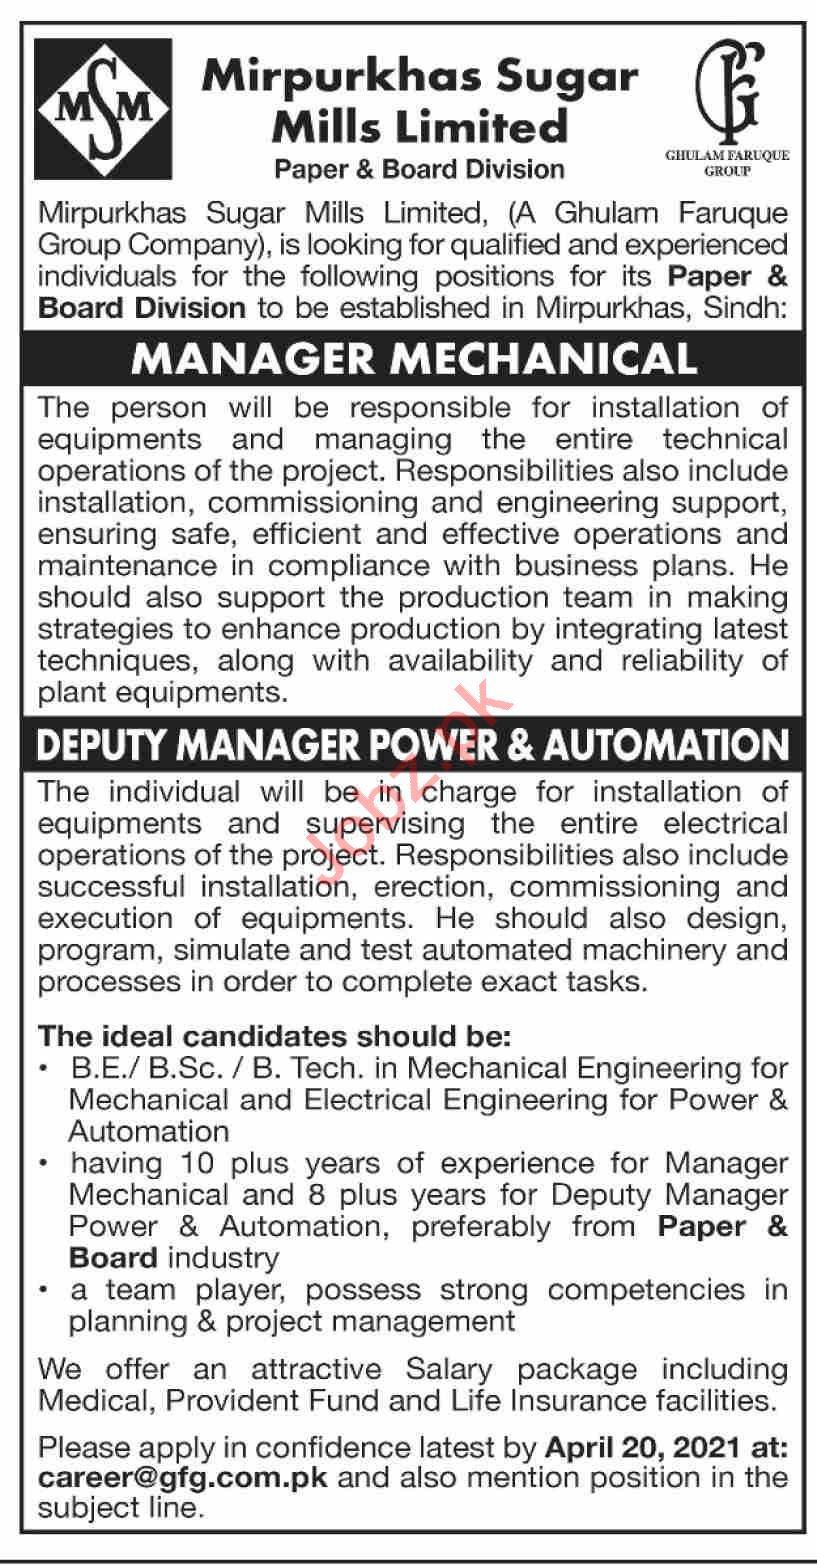 Mirpurkhas Sugar Mills MSM Karachi Jobs 2021 for Manager